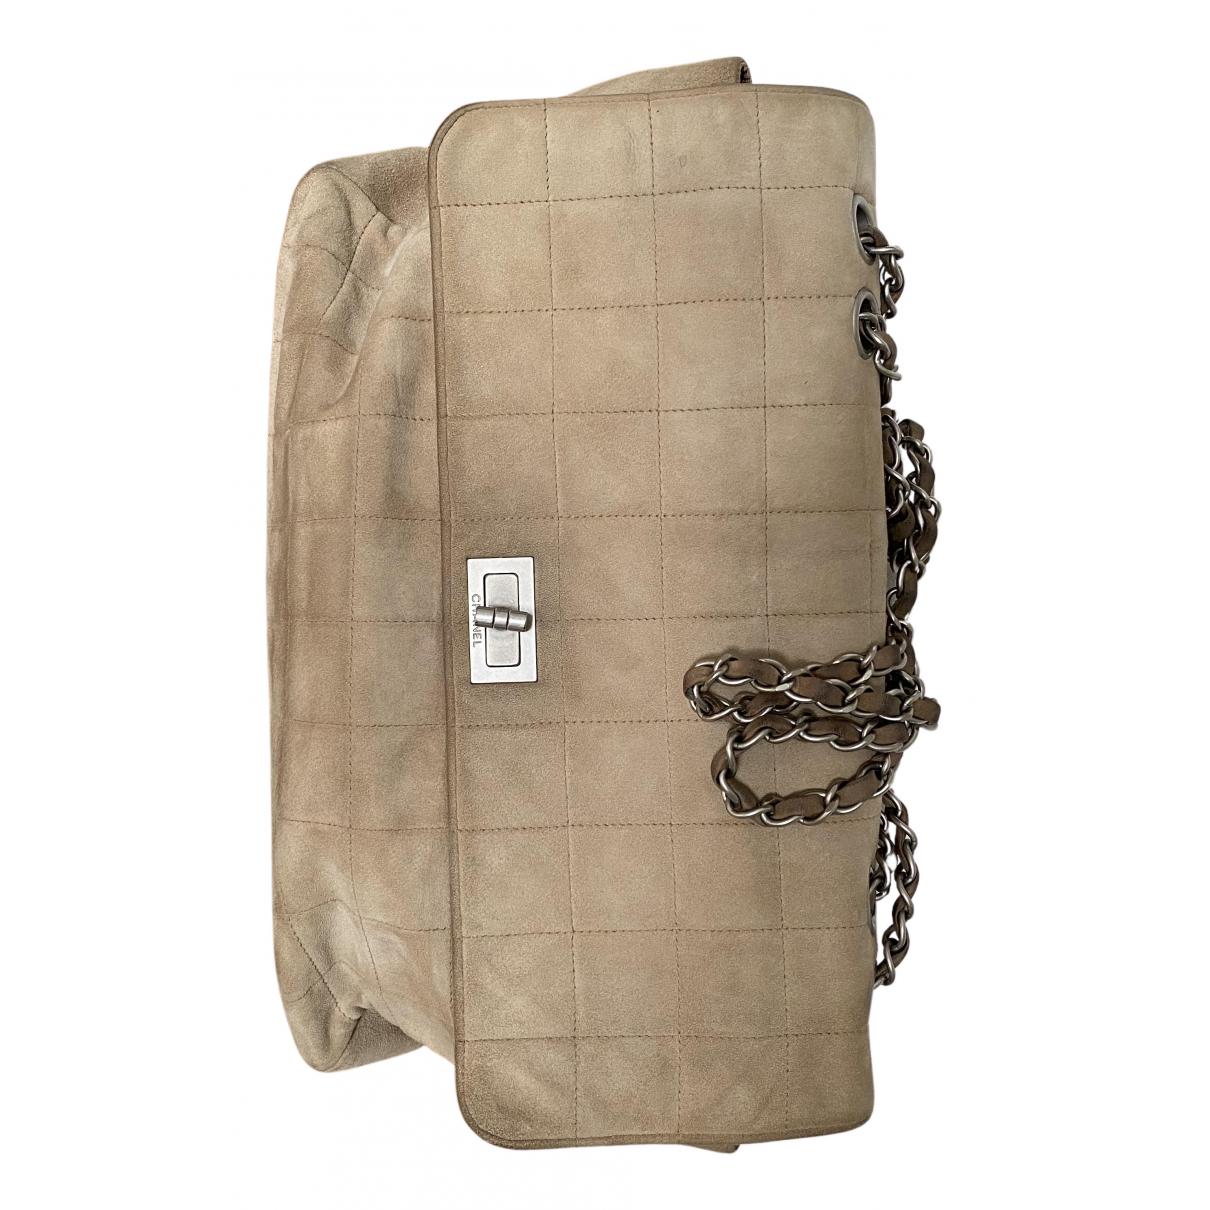 Chanel 2.55 Handtasche in  Beige Veloursleder